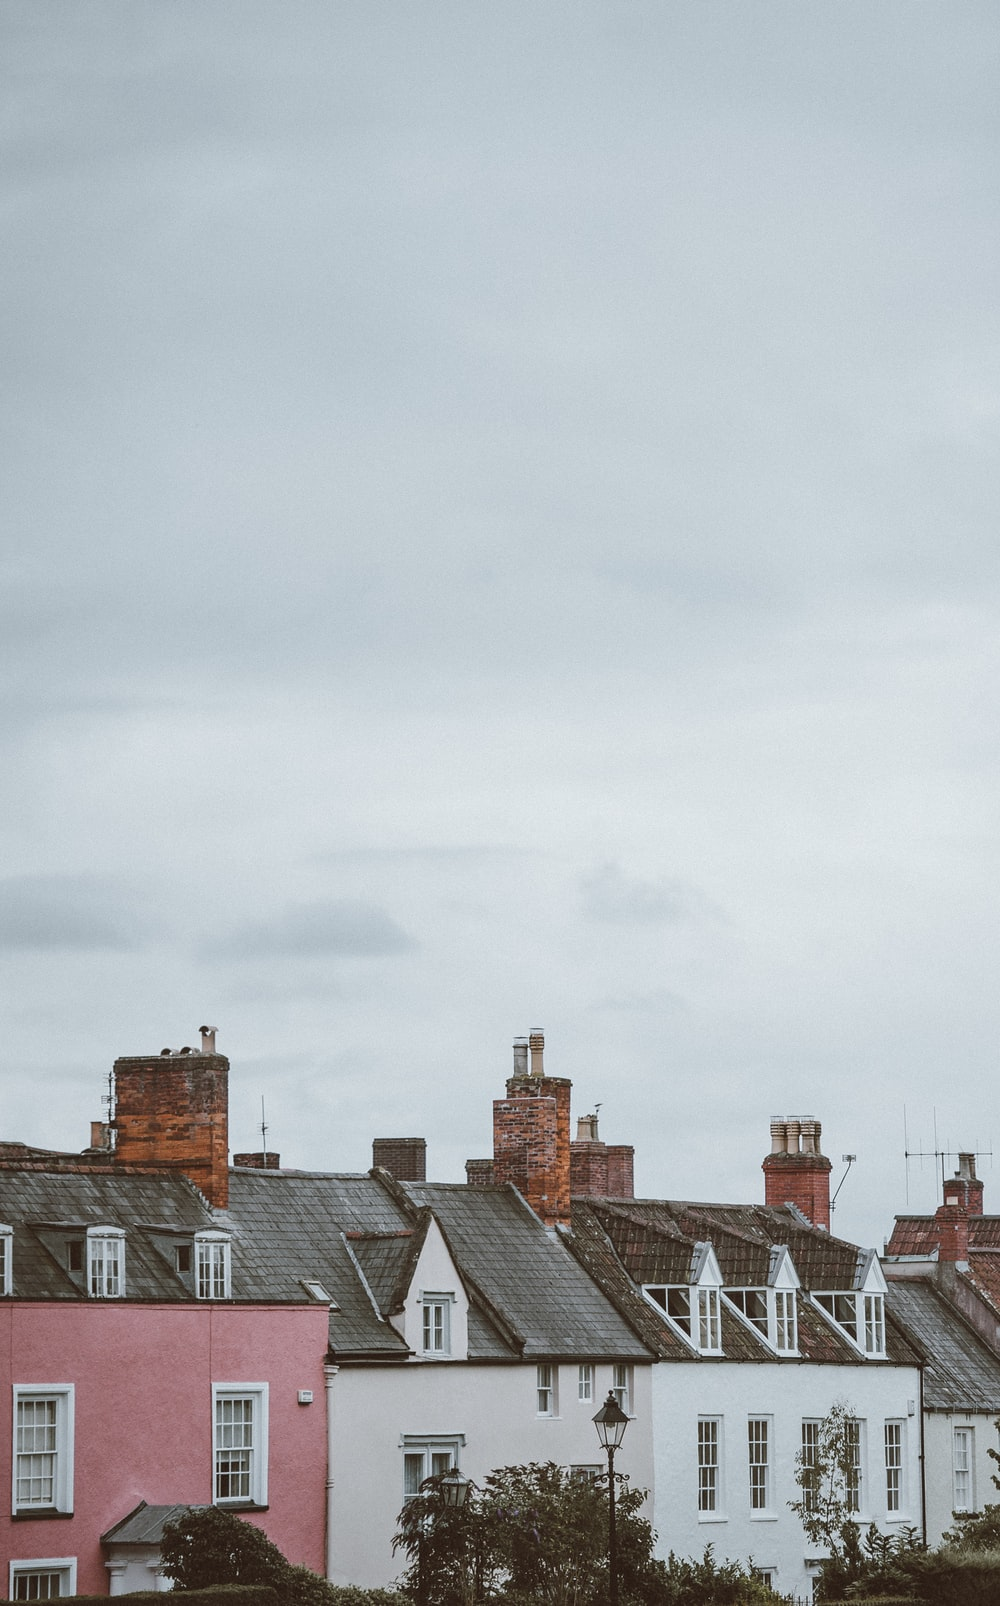 houses under cloudy sky